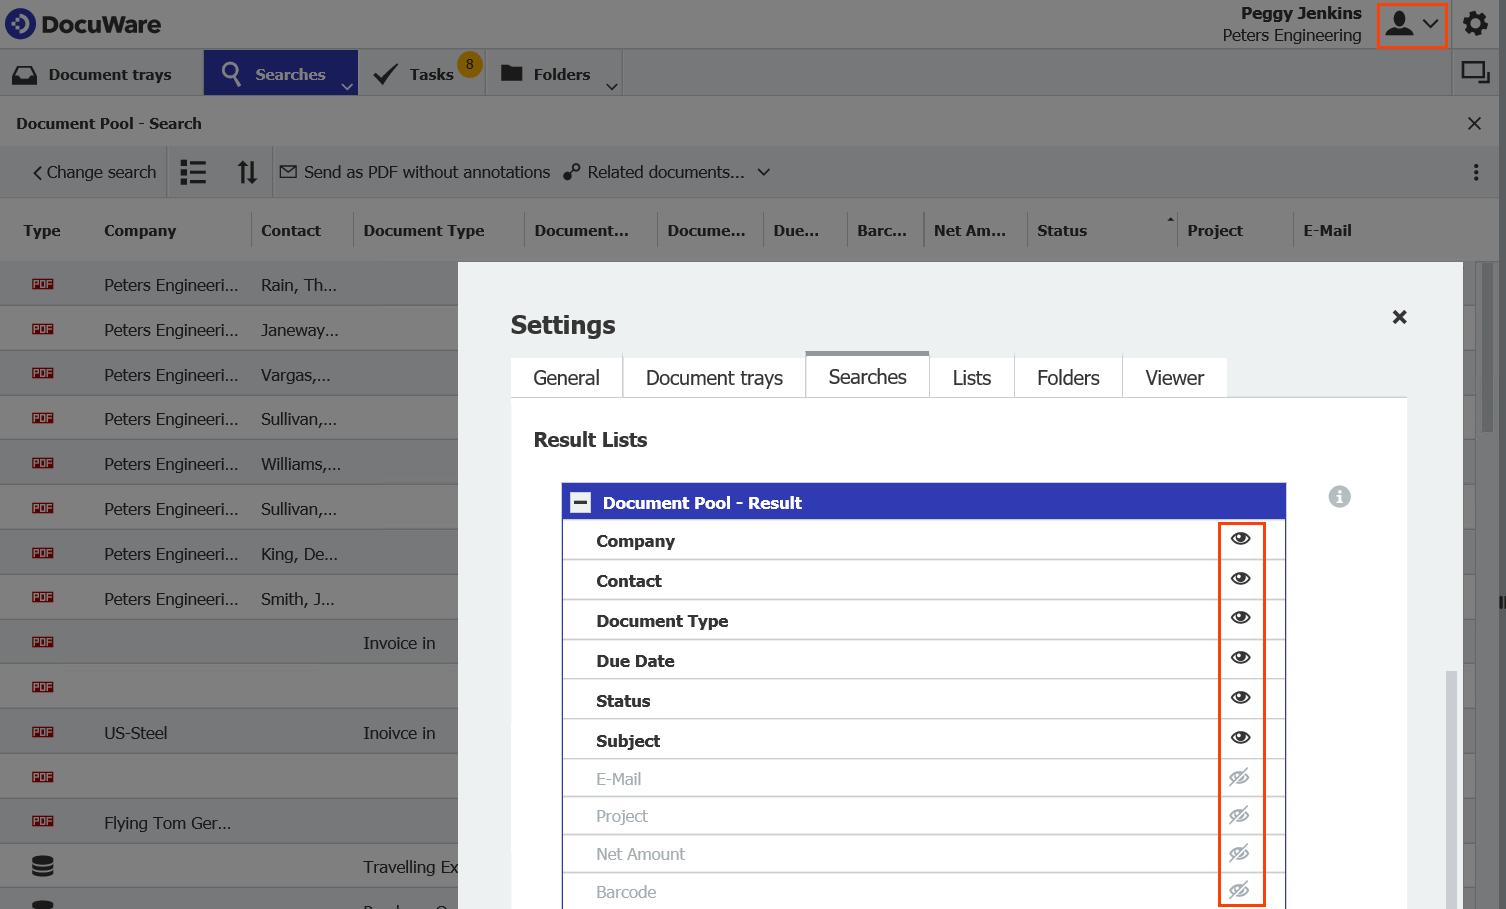 DocuWare Client Result List Optimization